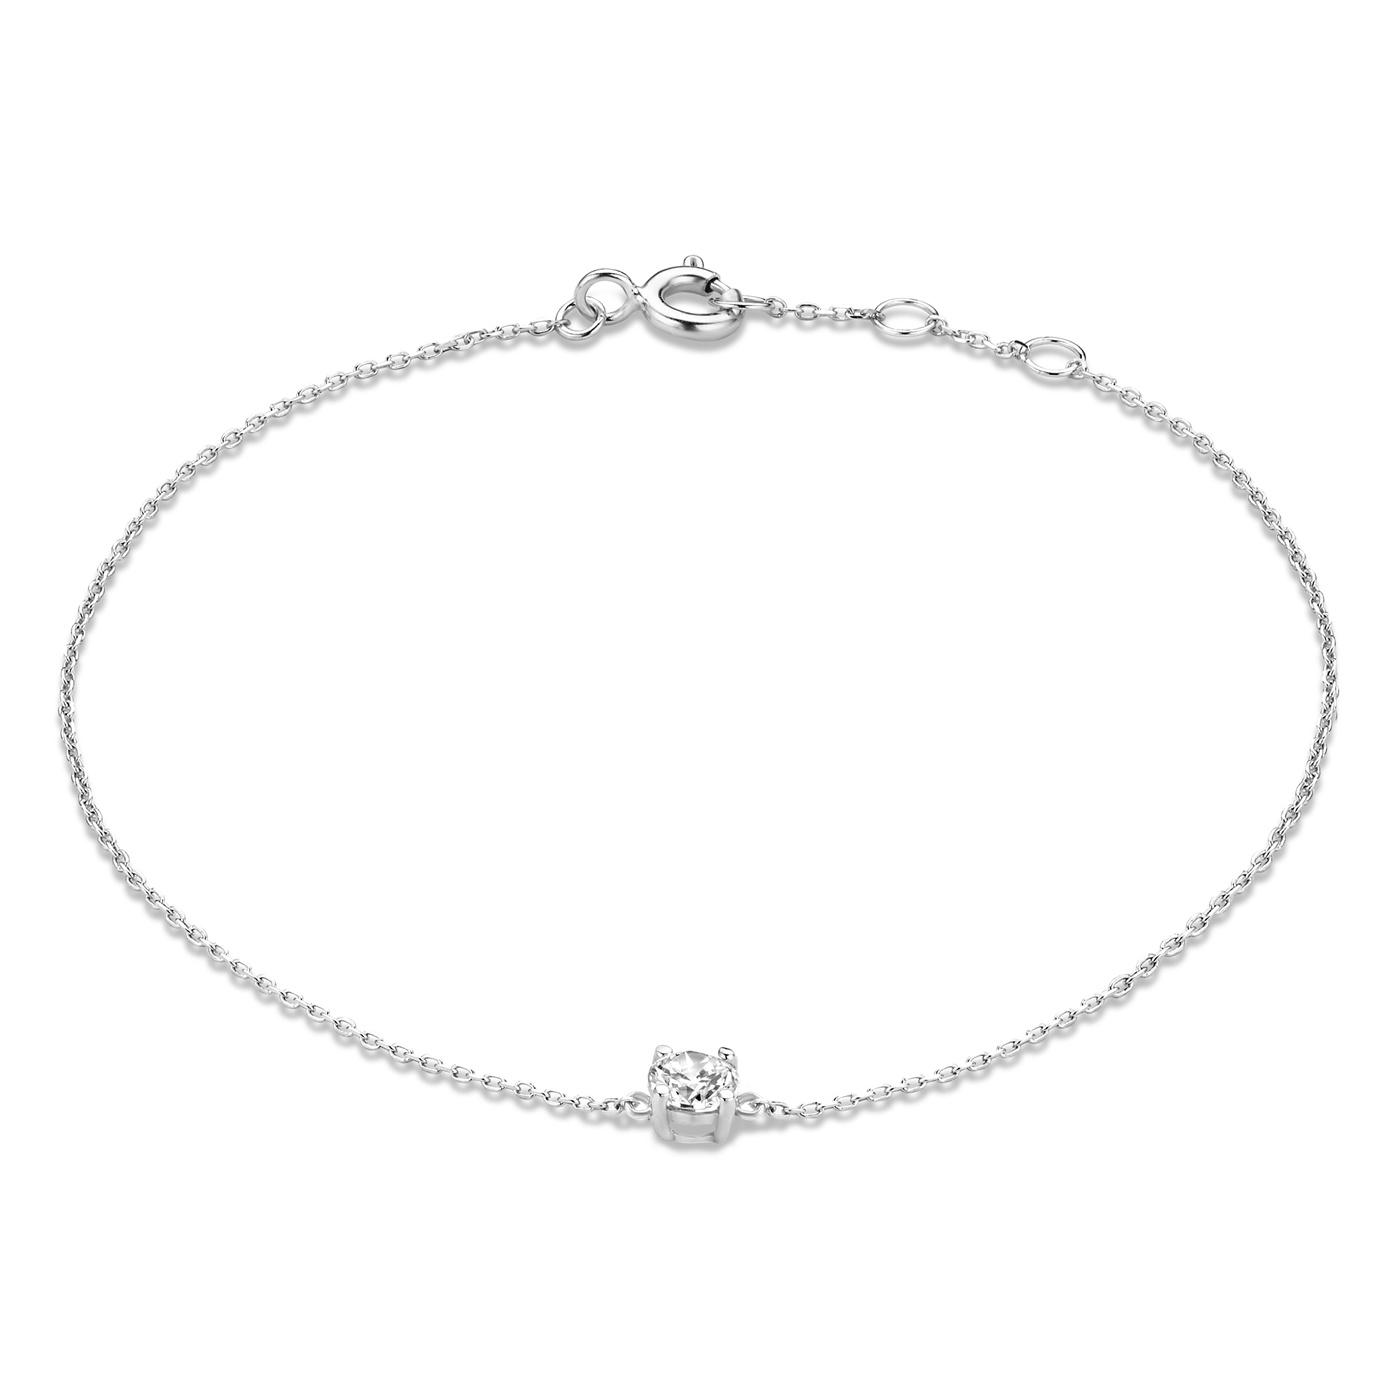 Isabel Bernard Saint Germain Faïs bracelet en or blanc 14 carats